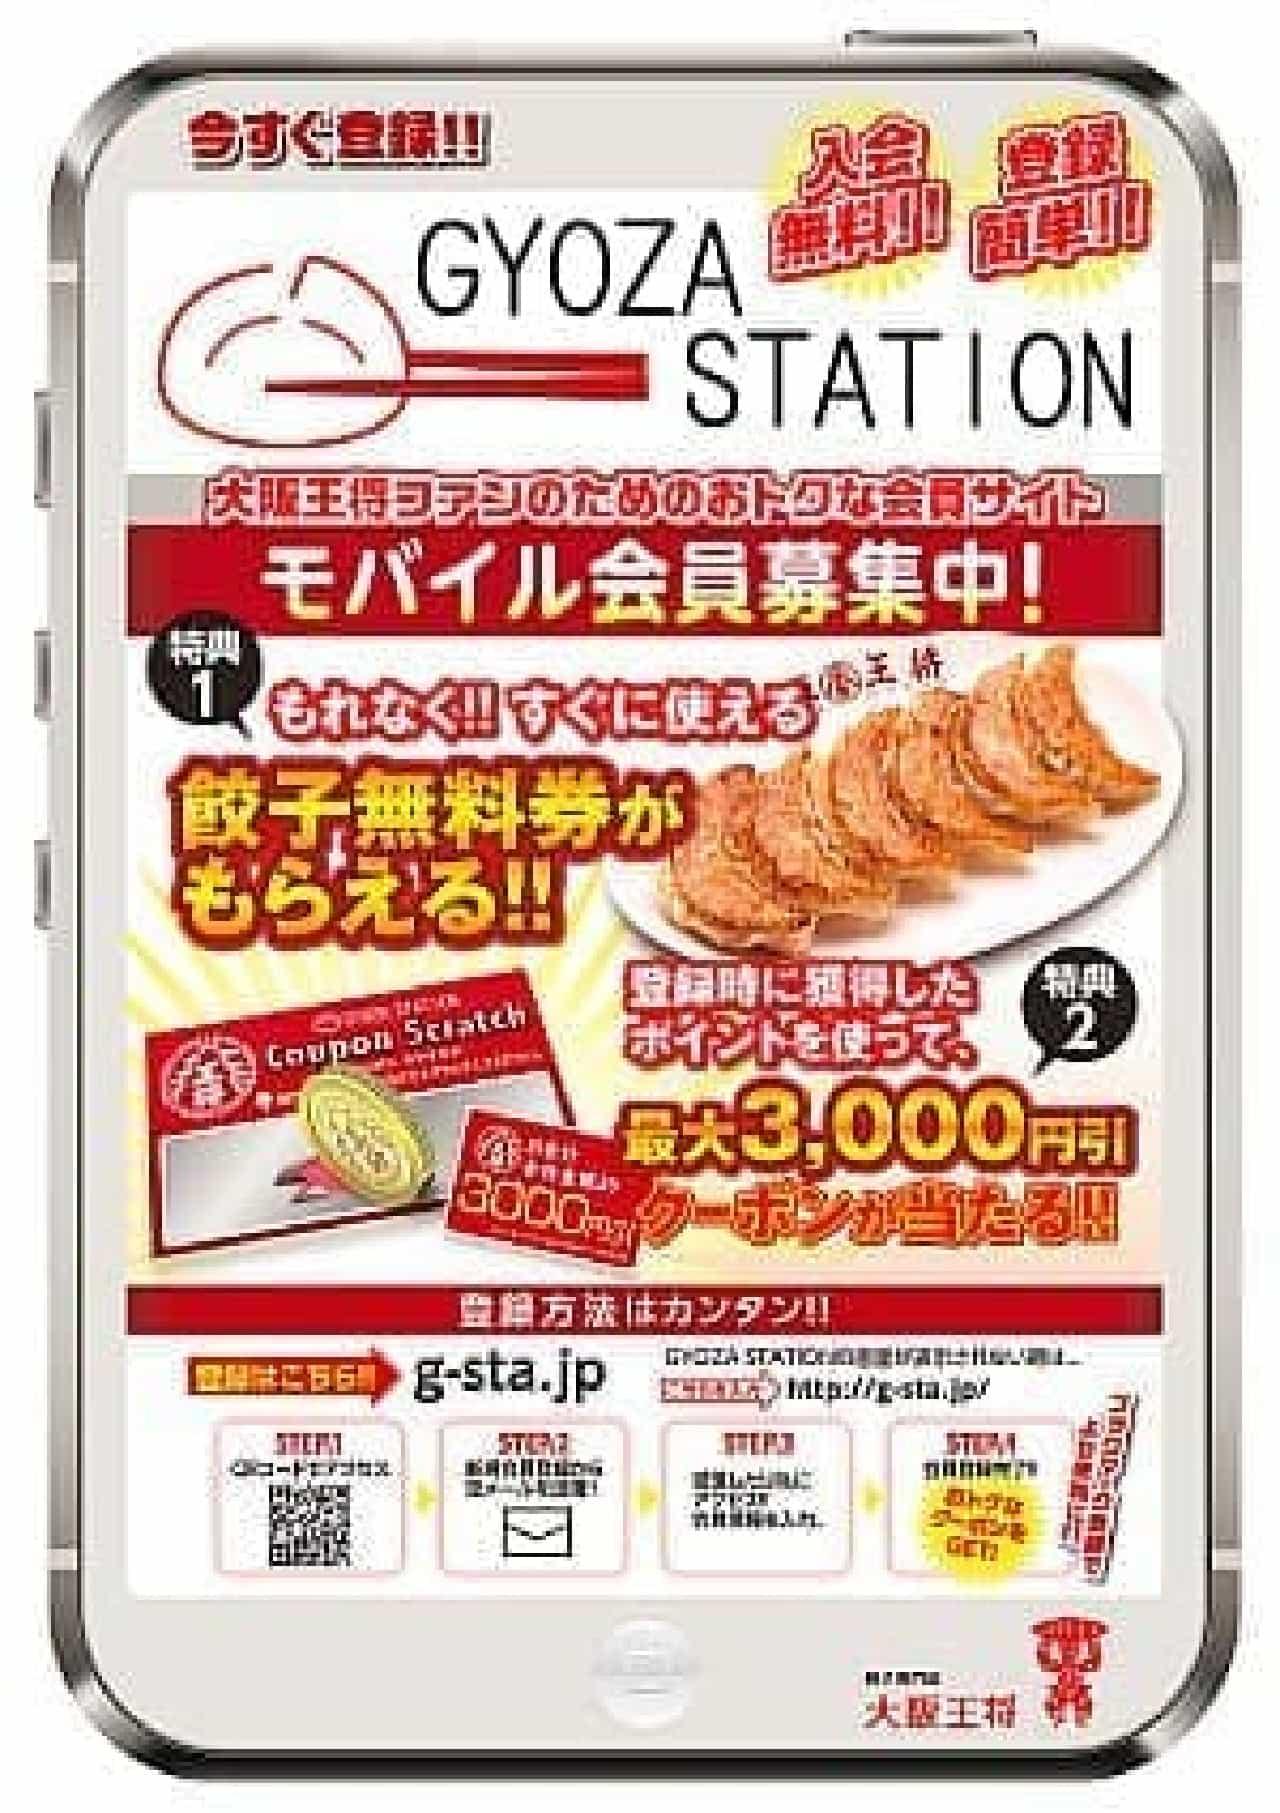 GYOZA STATION 画面イメージ